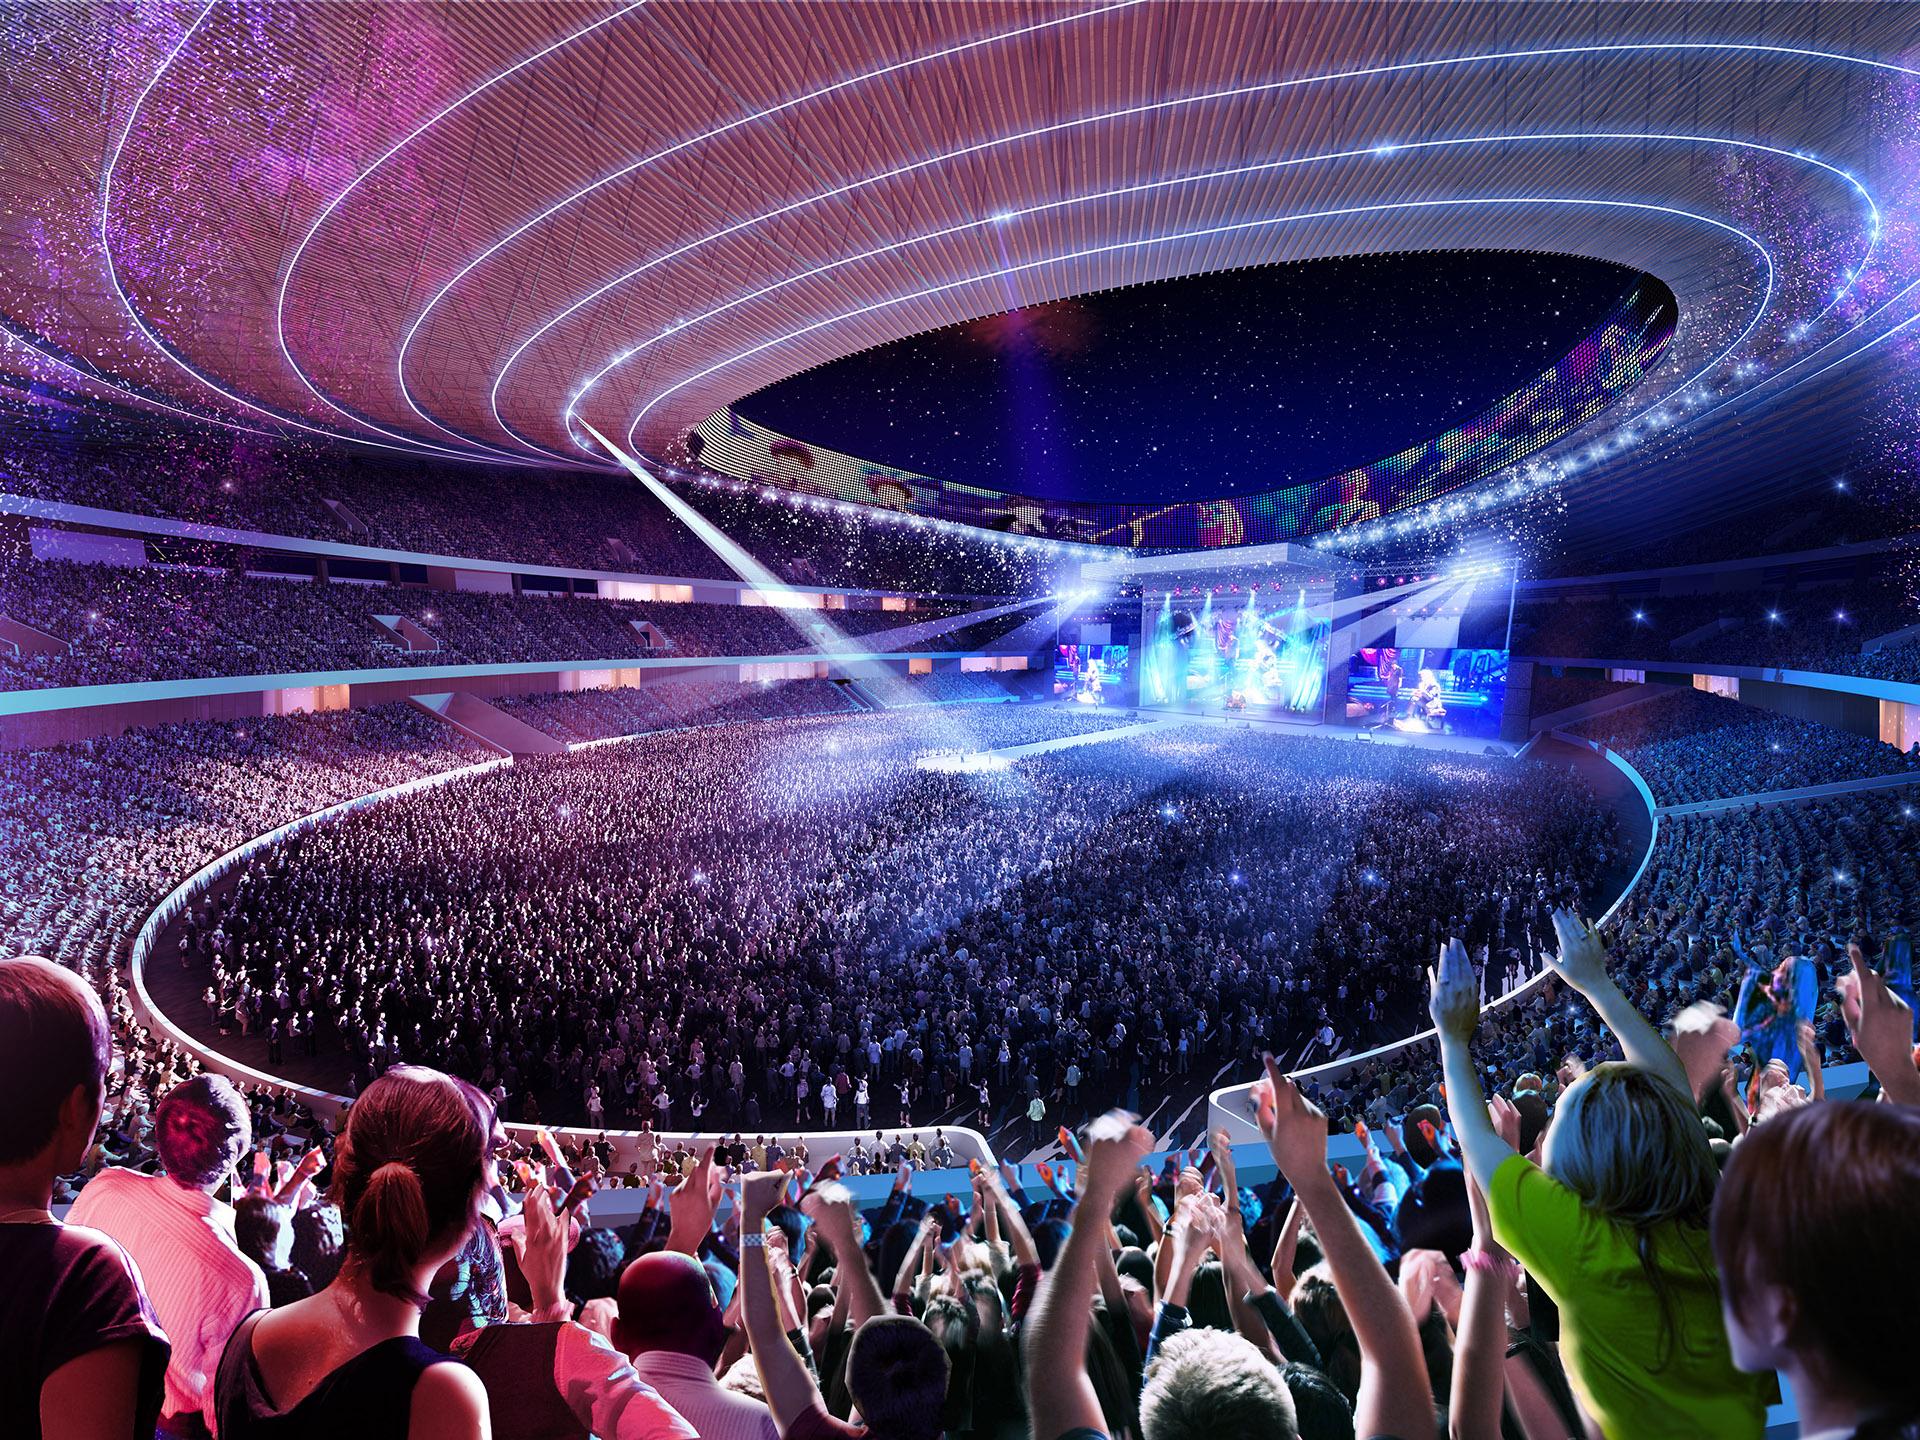 GMP_Tokyo_Stadium_Concert_interiorvisual_by_xoio